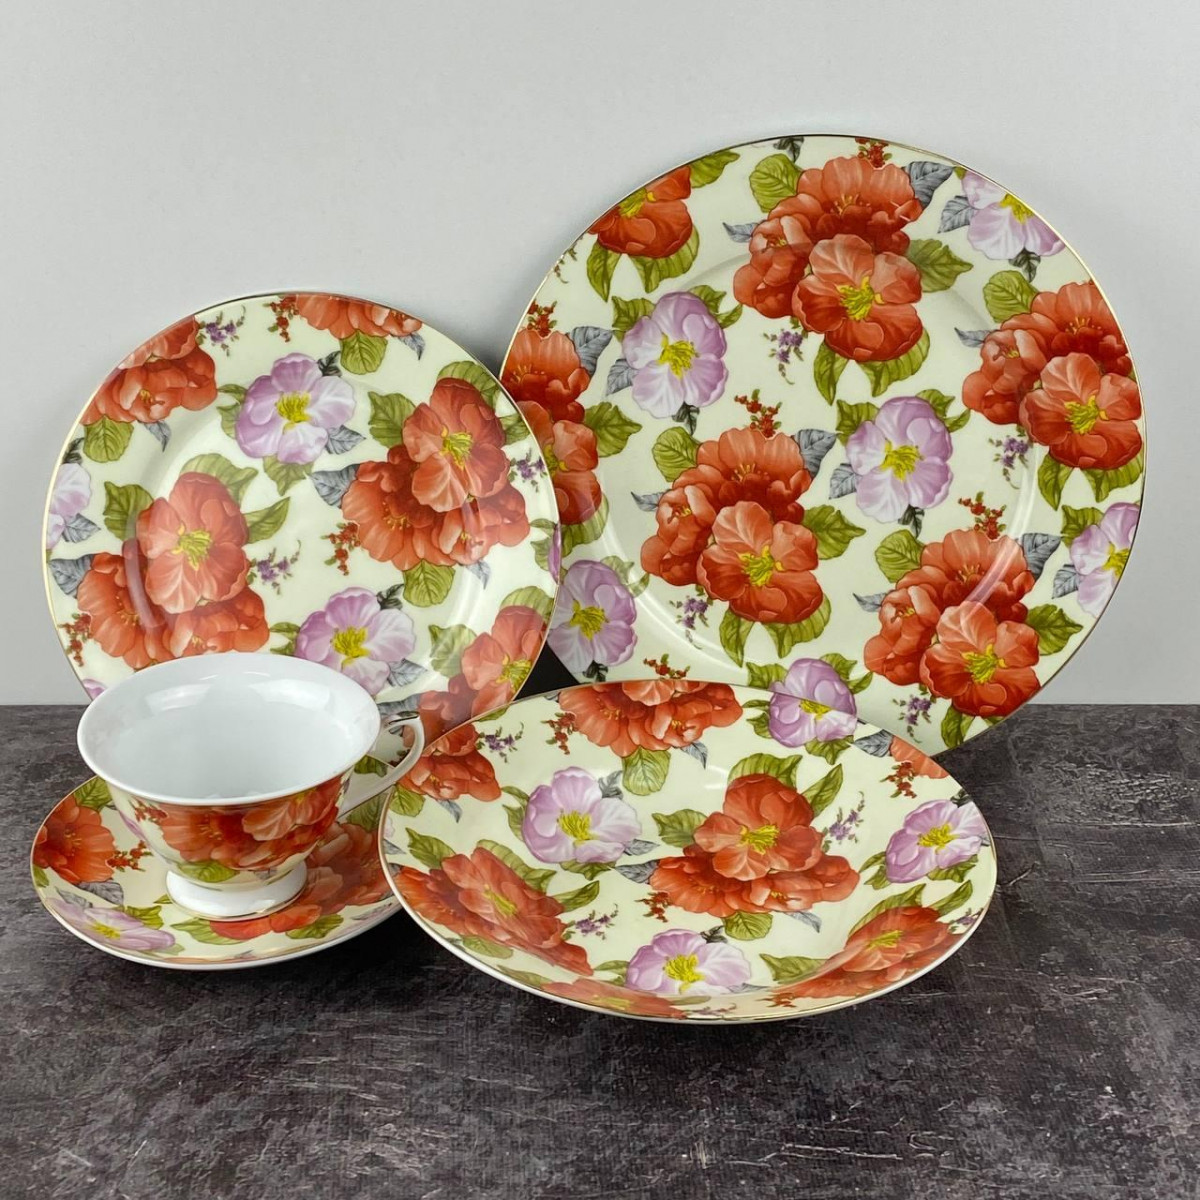 Сервиз столовый Ideal Сакура ID-2801 30 предметов